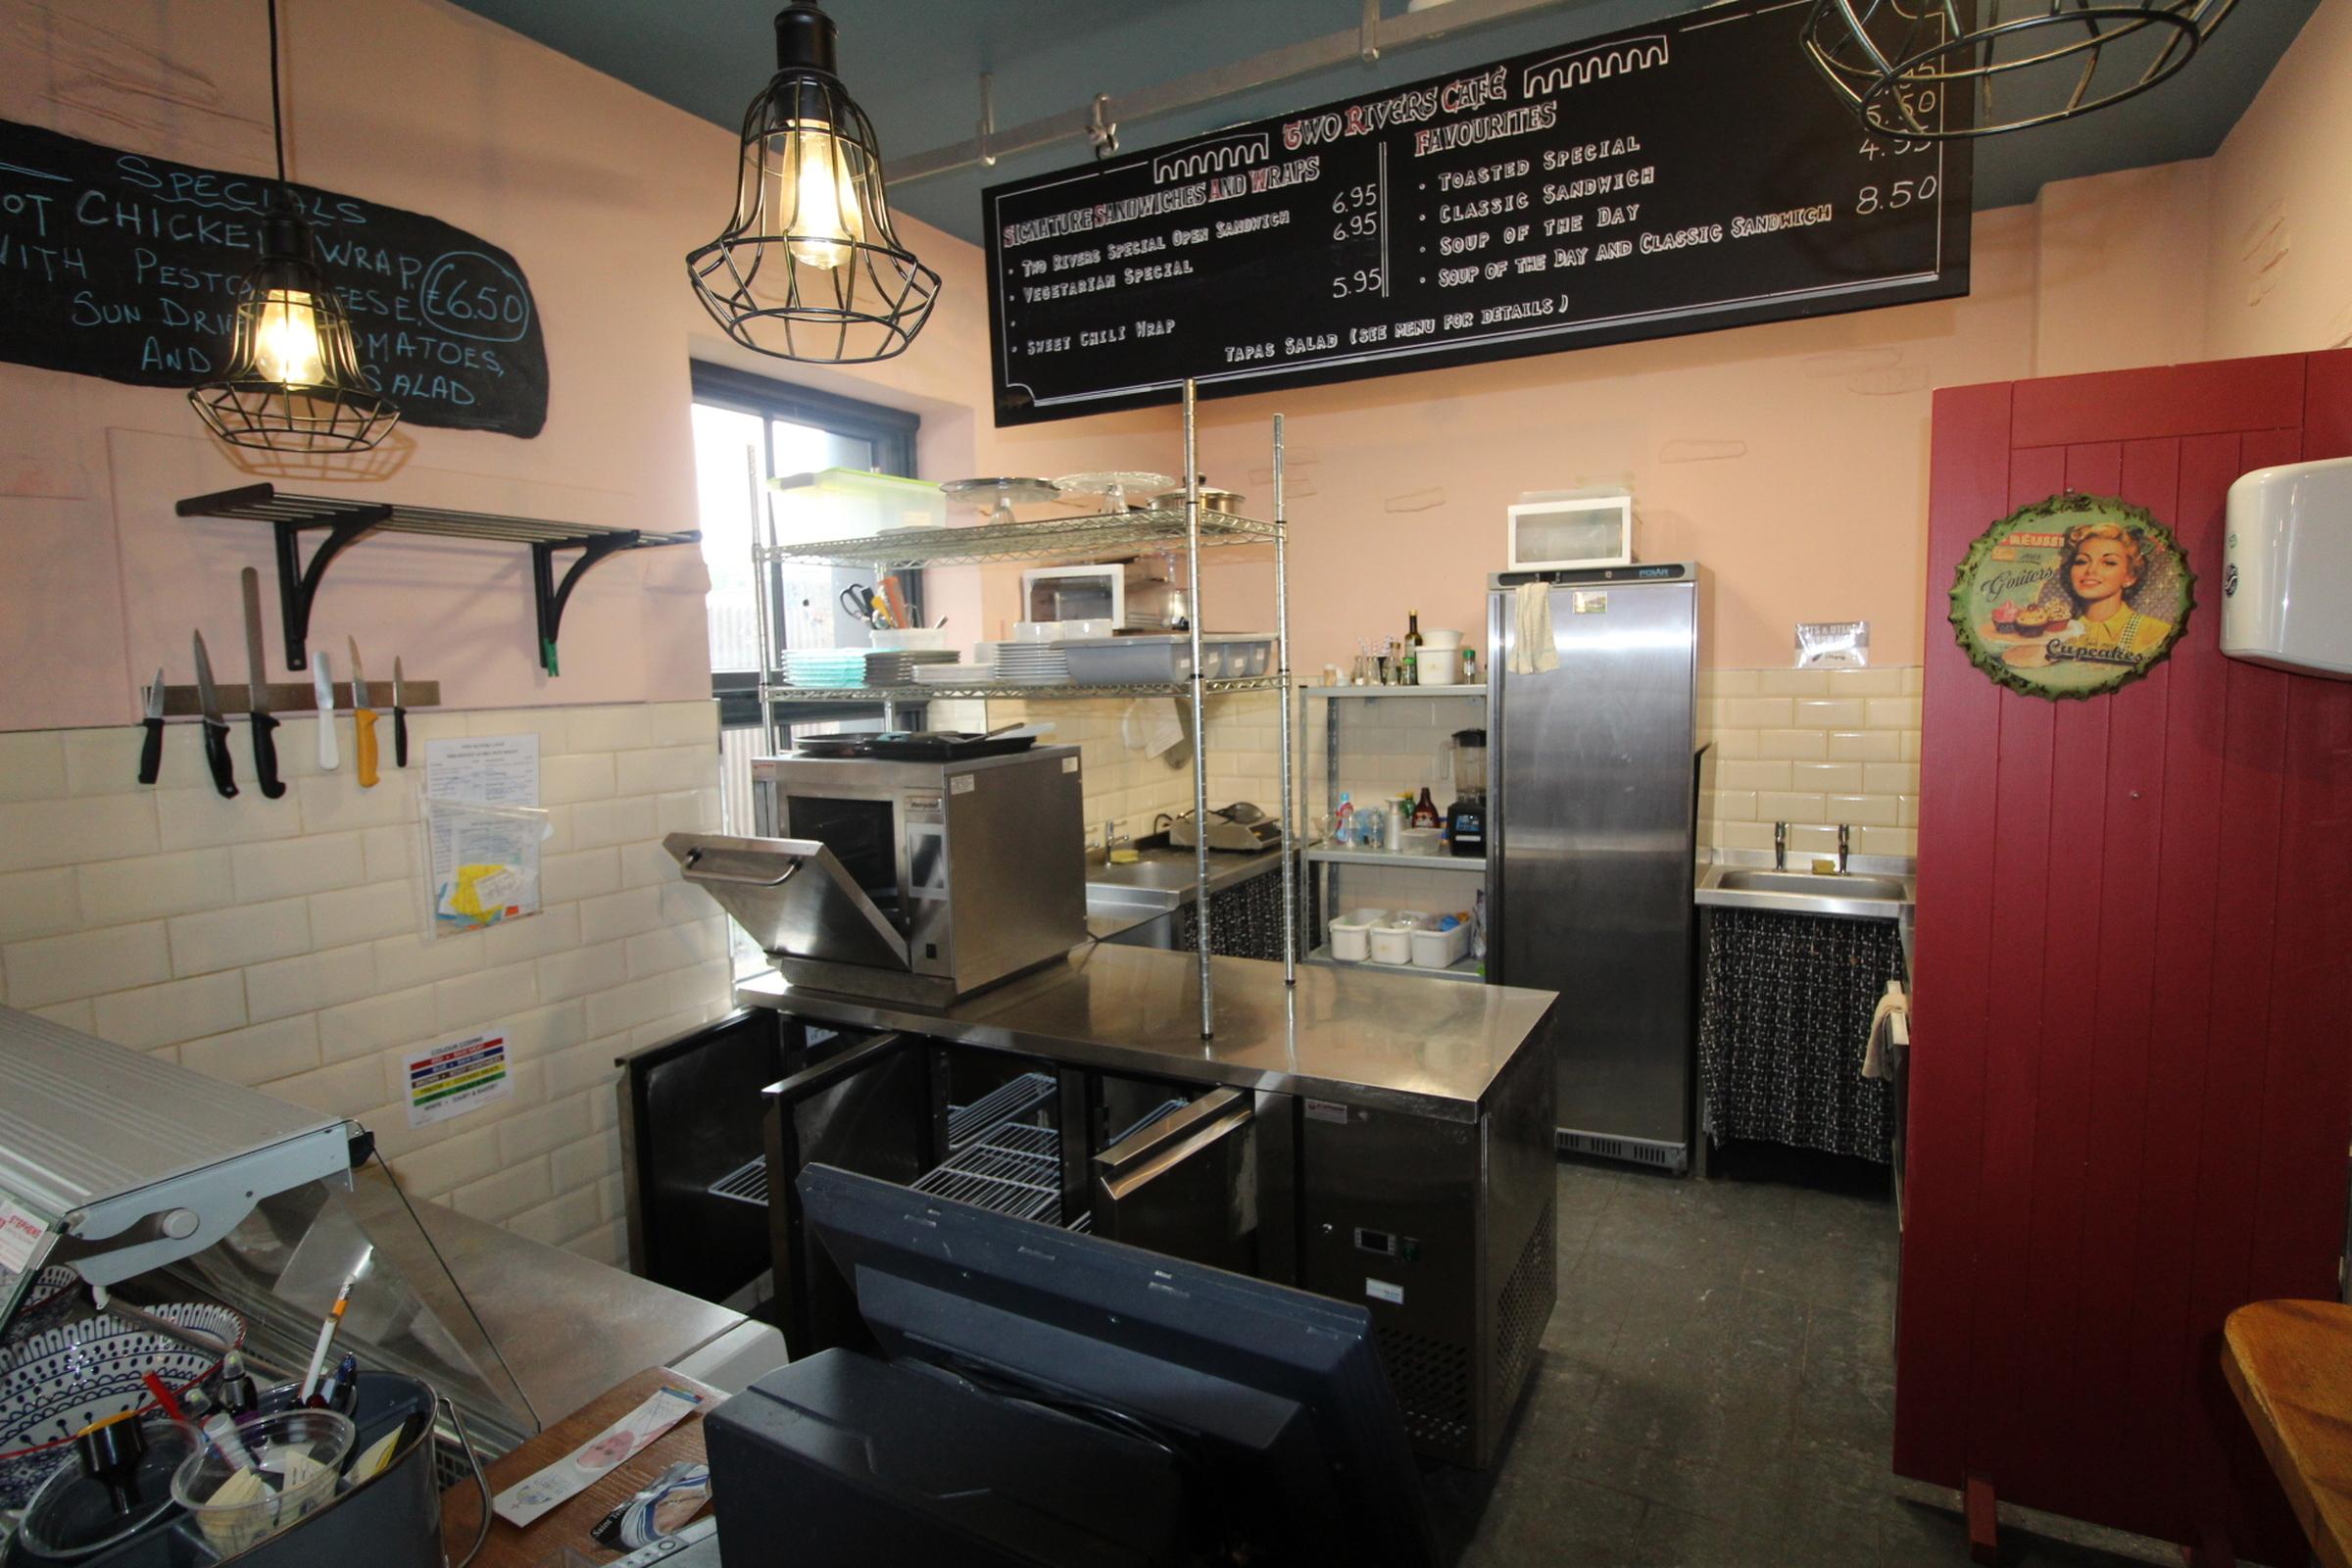 Two Rivers Cafe, Strand Street, Kanturk, Co. Cork